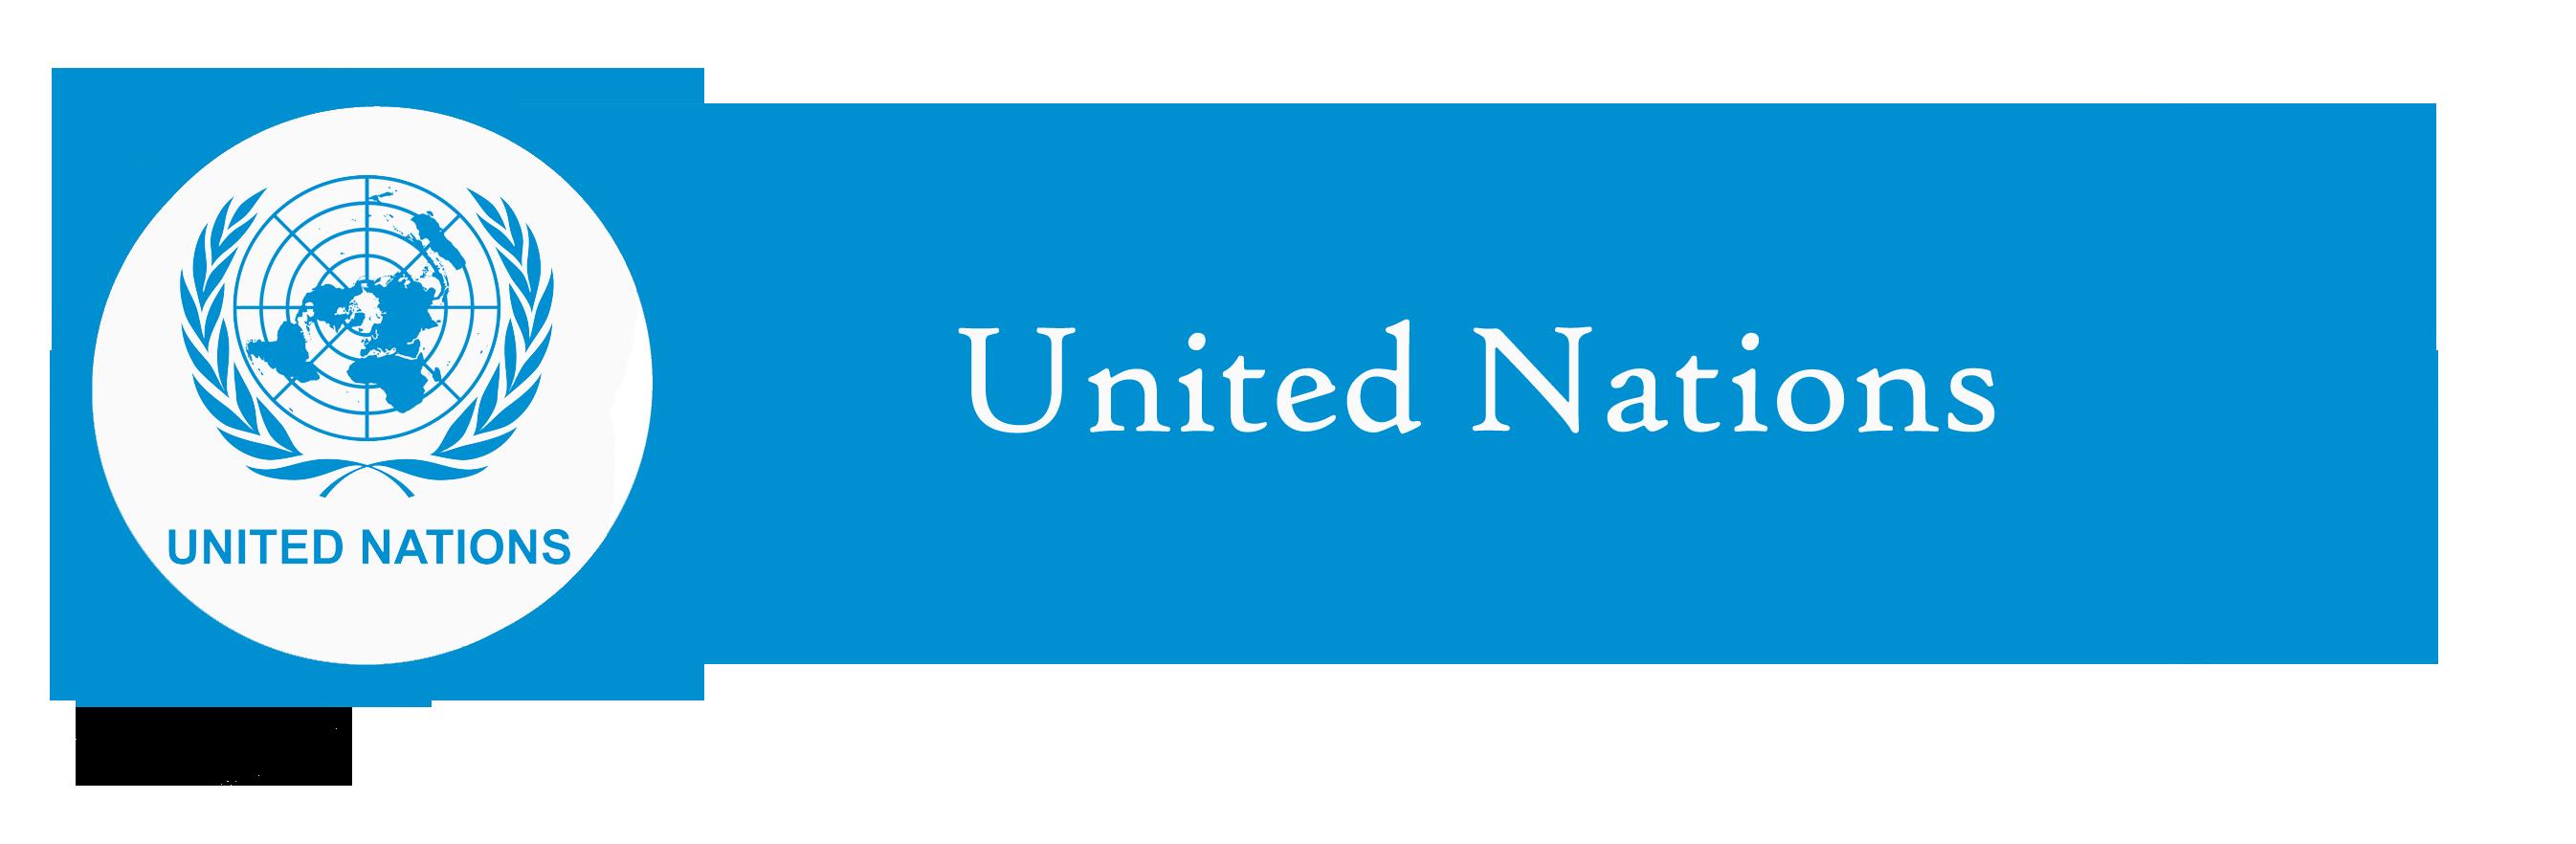 important international organisations